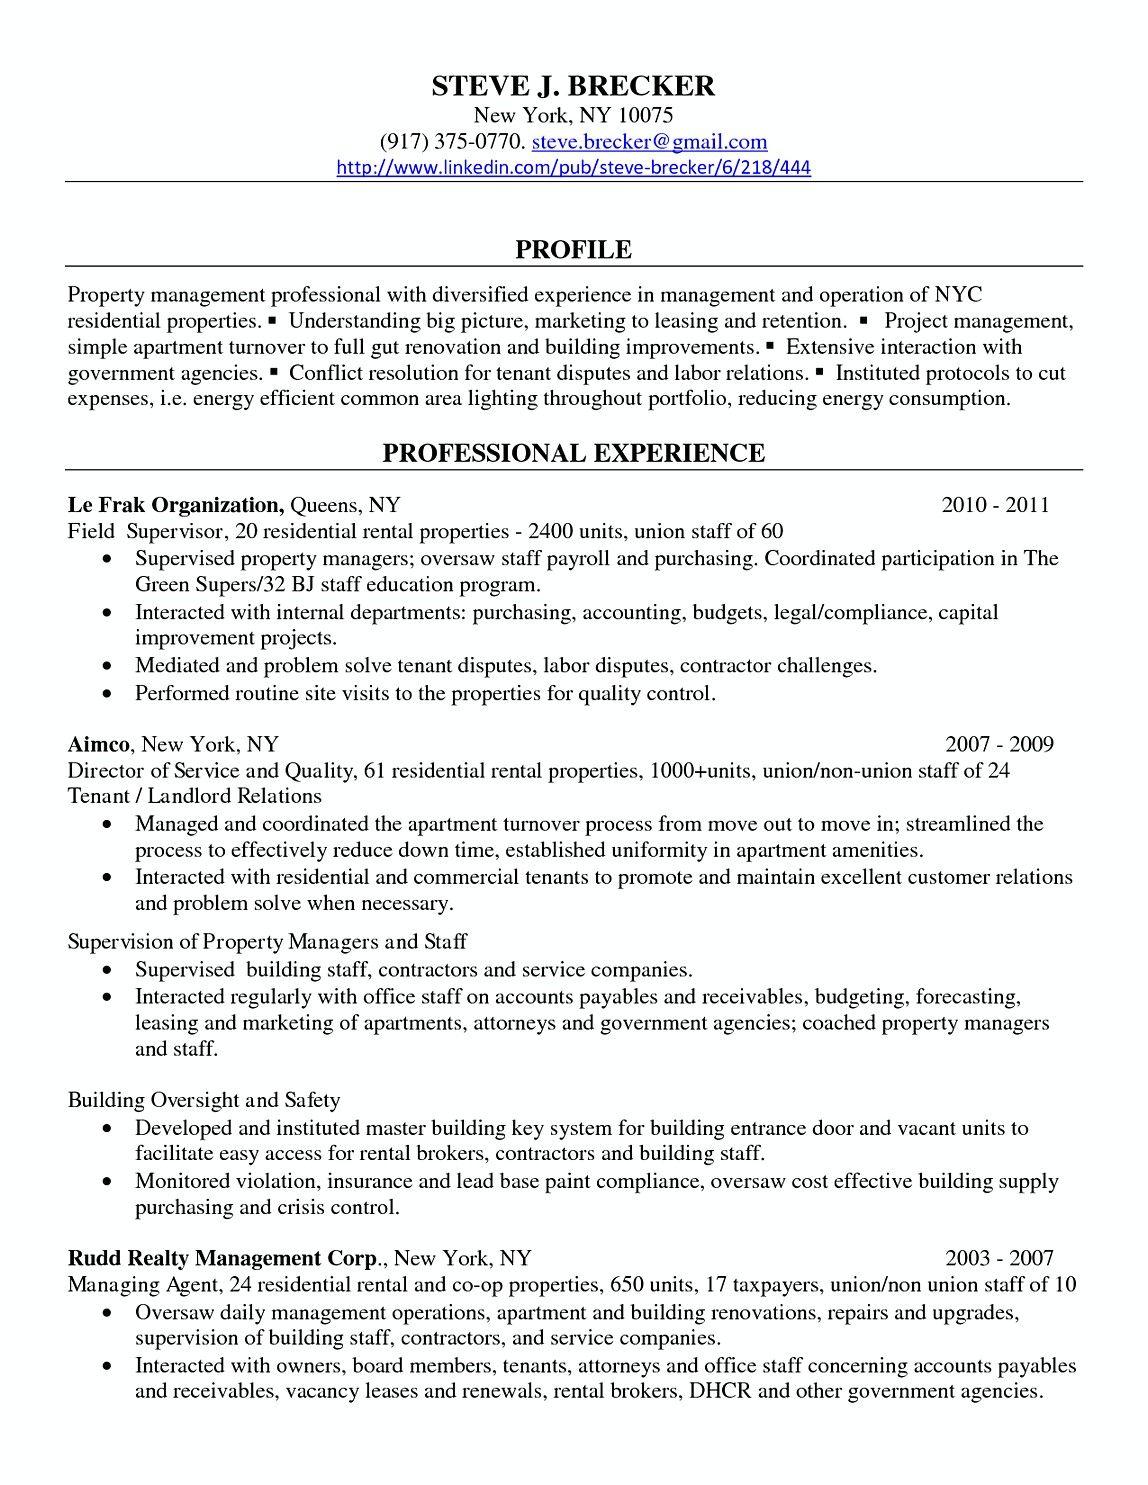 Property Manager Professional Resume Samples Commercial Property Manager Resume Interested In Working Manager Resume Job Resume Examples Job Resume Samples